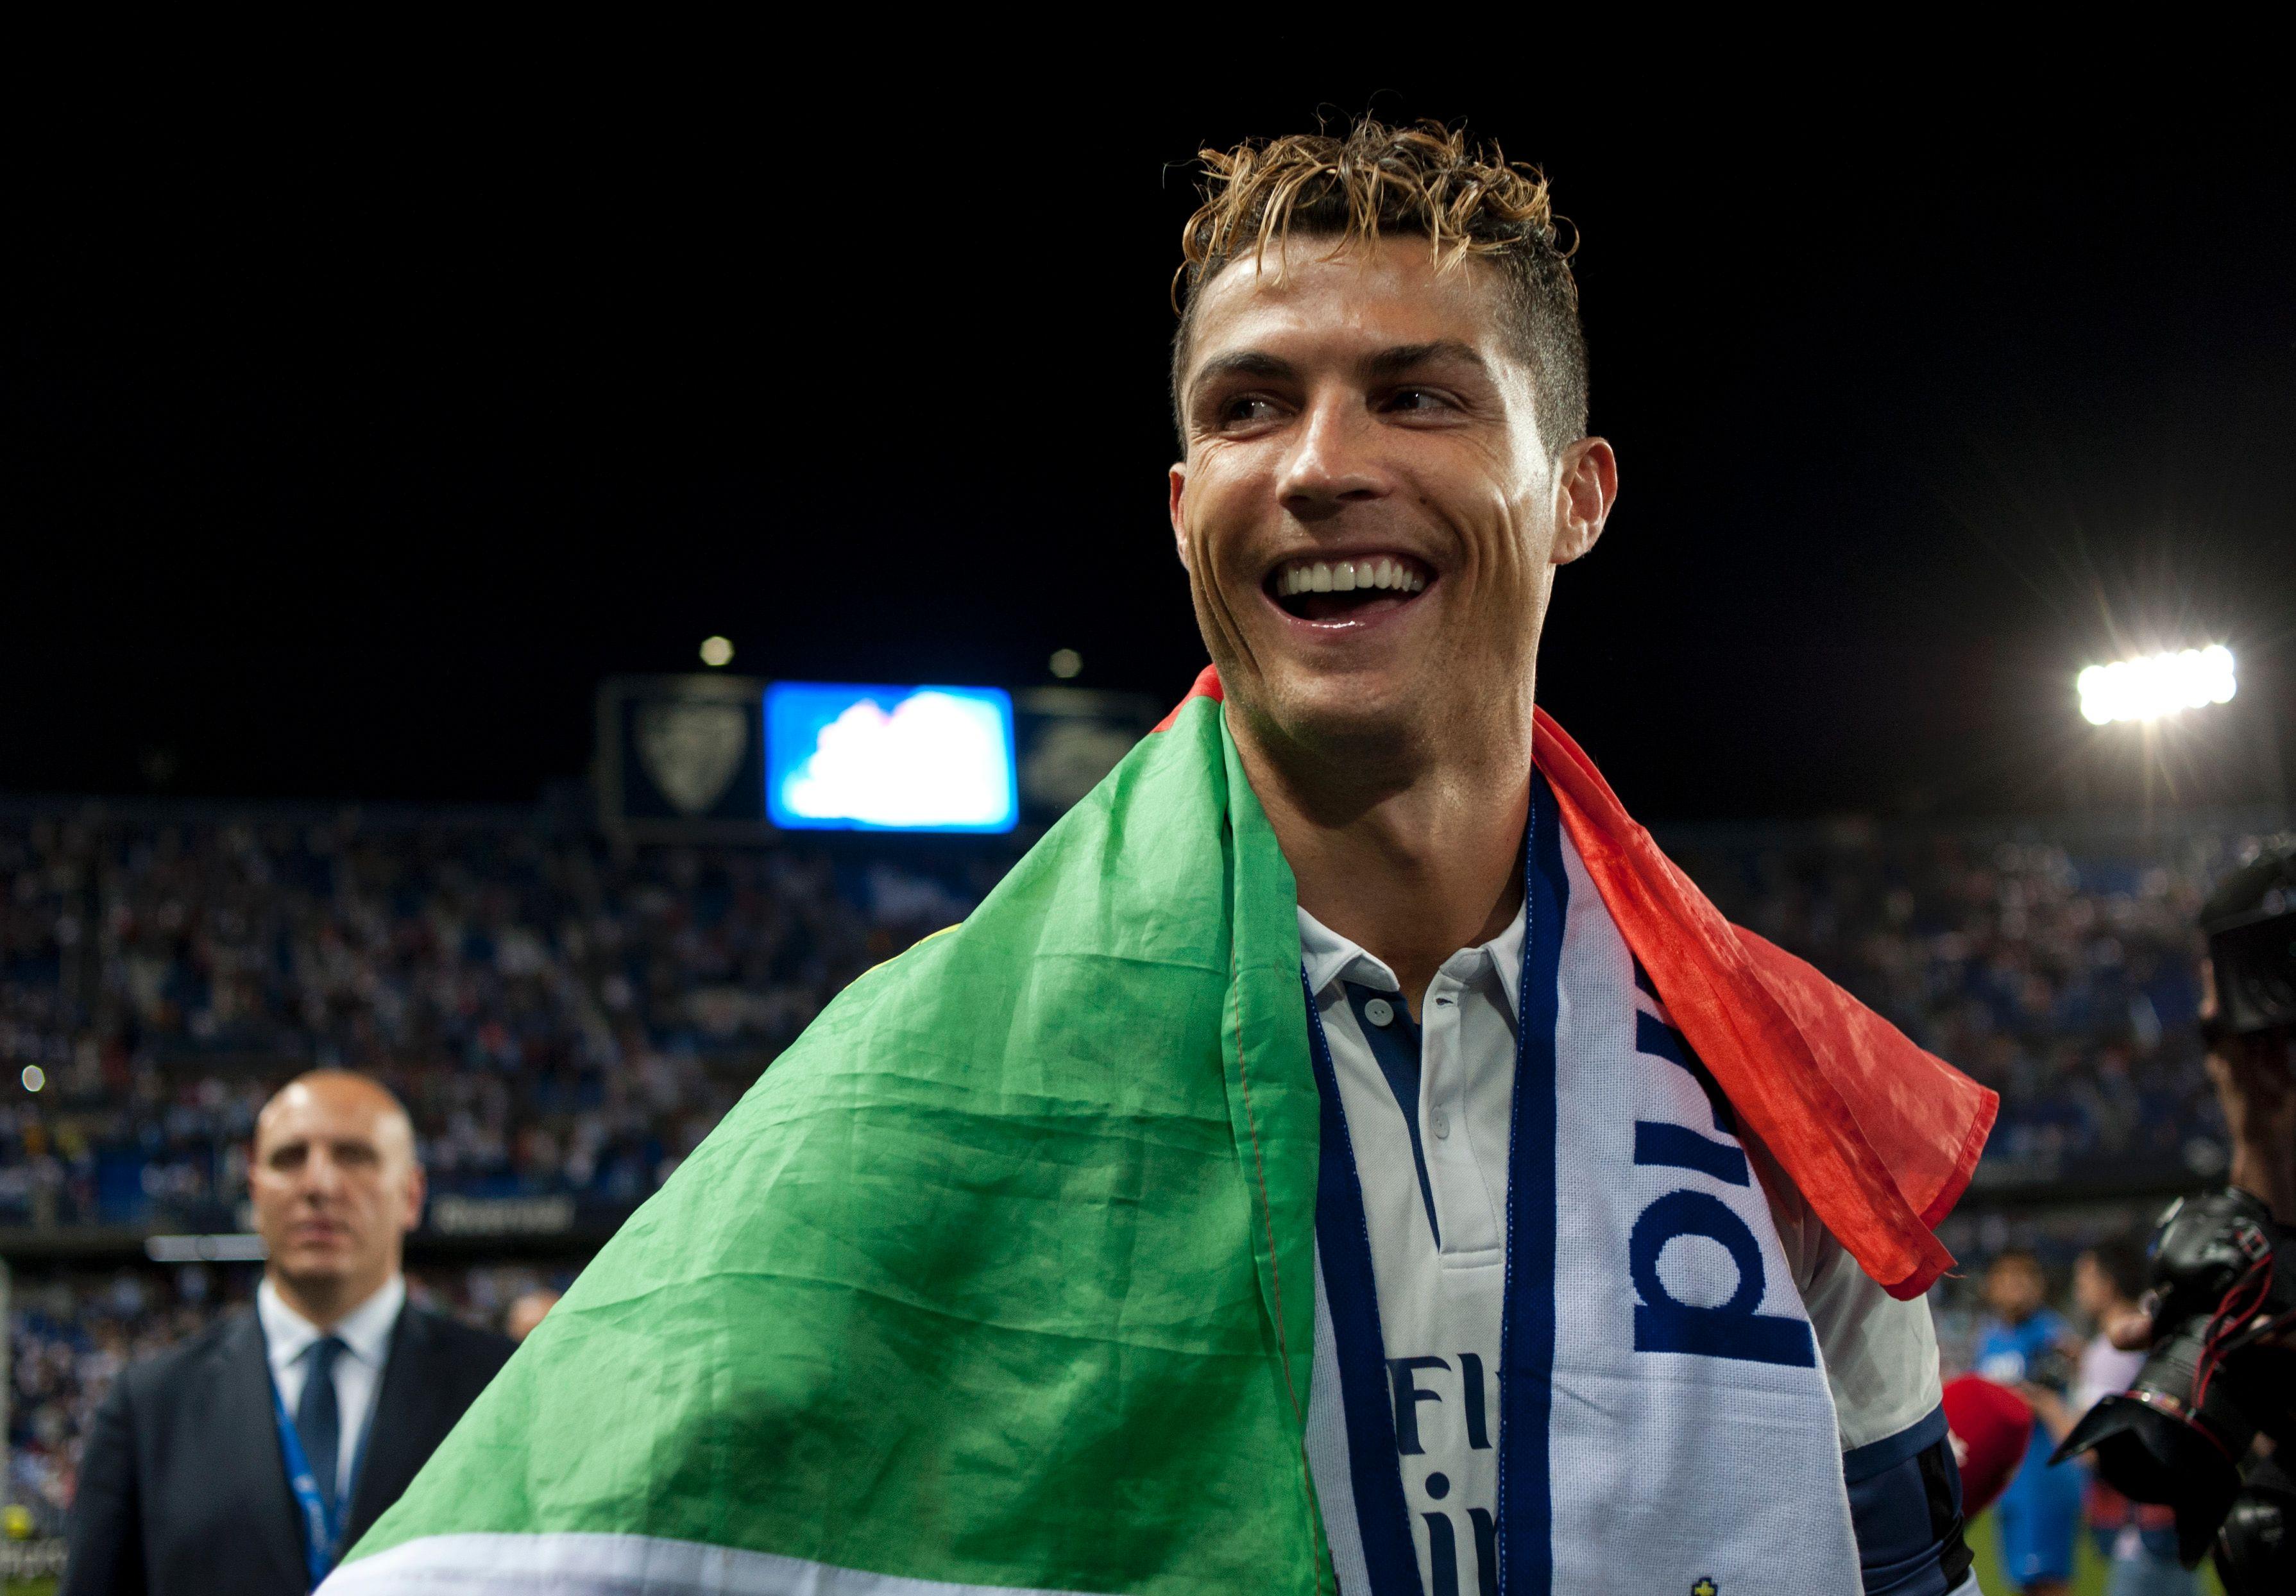 Portugal Fährt Mit Ronaldo Zum Confed Cup